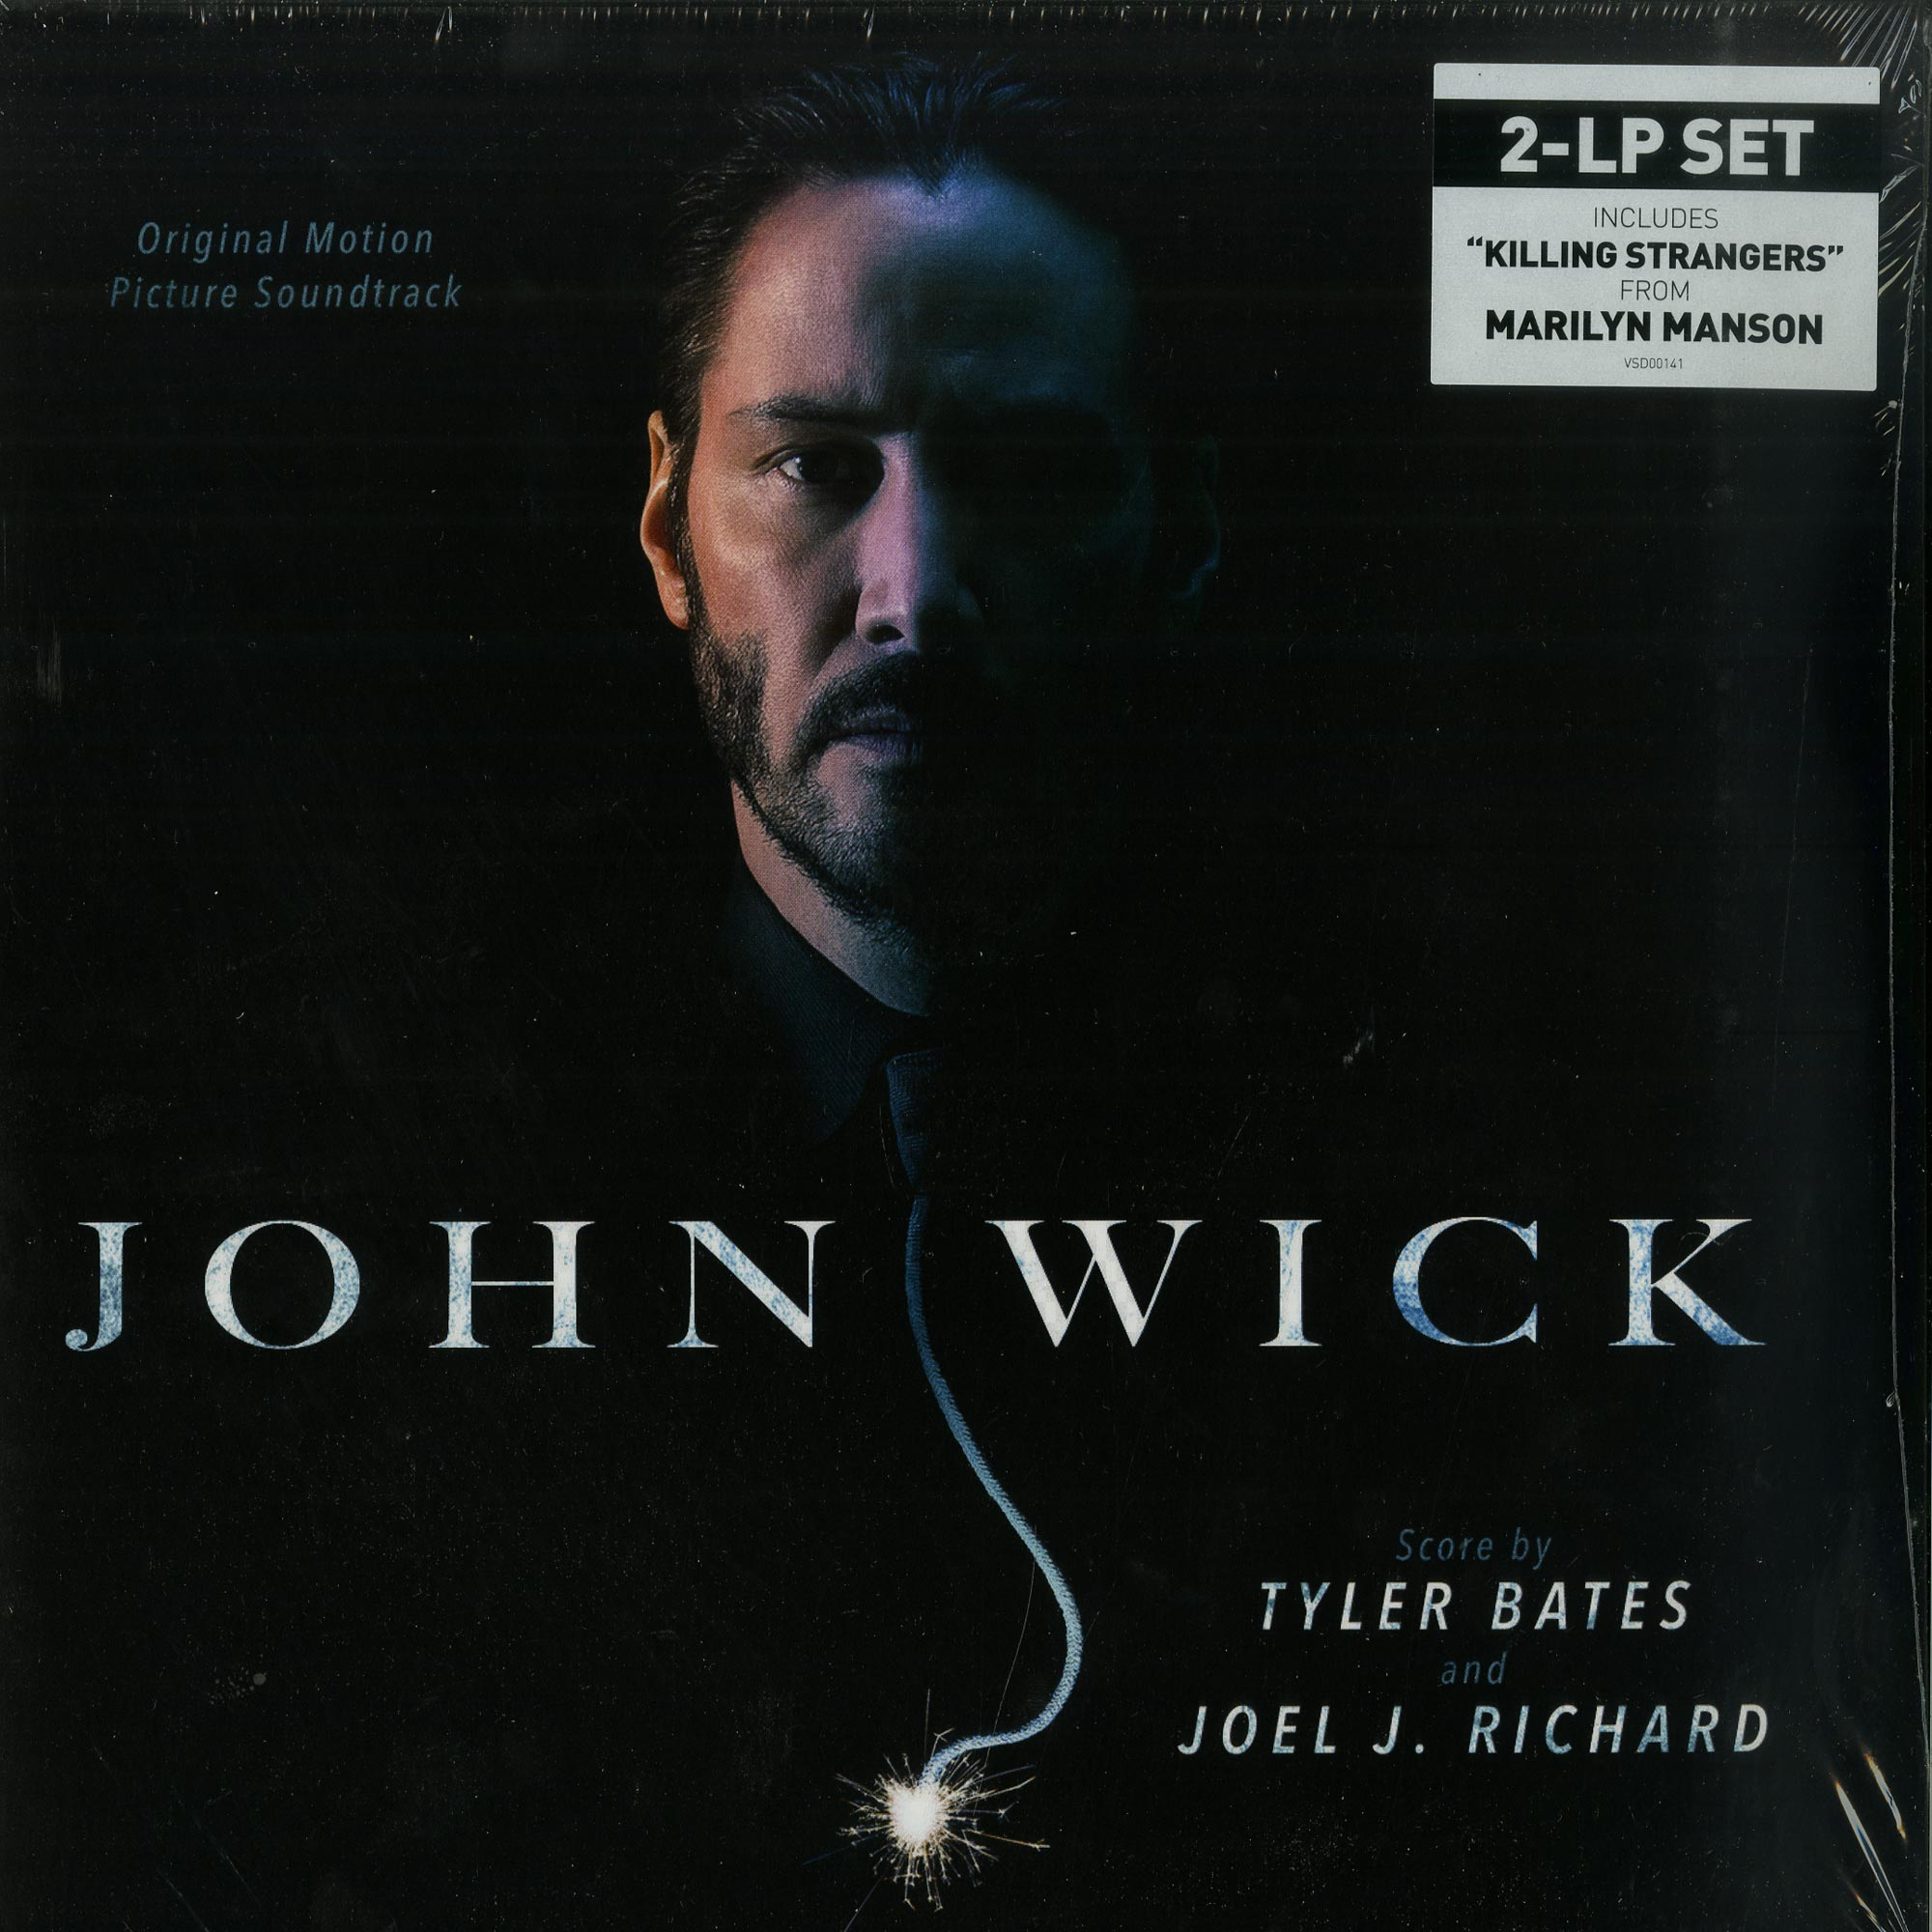 Tyler Bates & Joel J. Richard - JOHN WICK O.S.T.